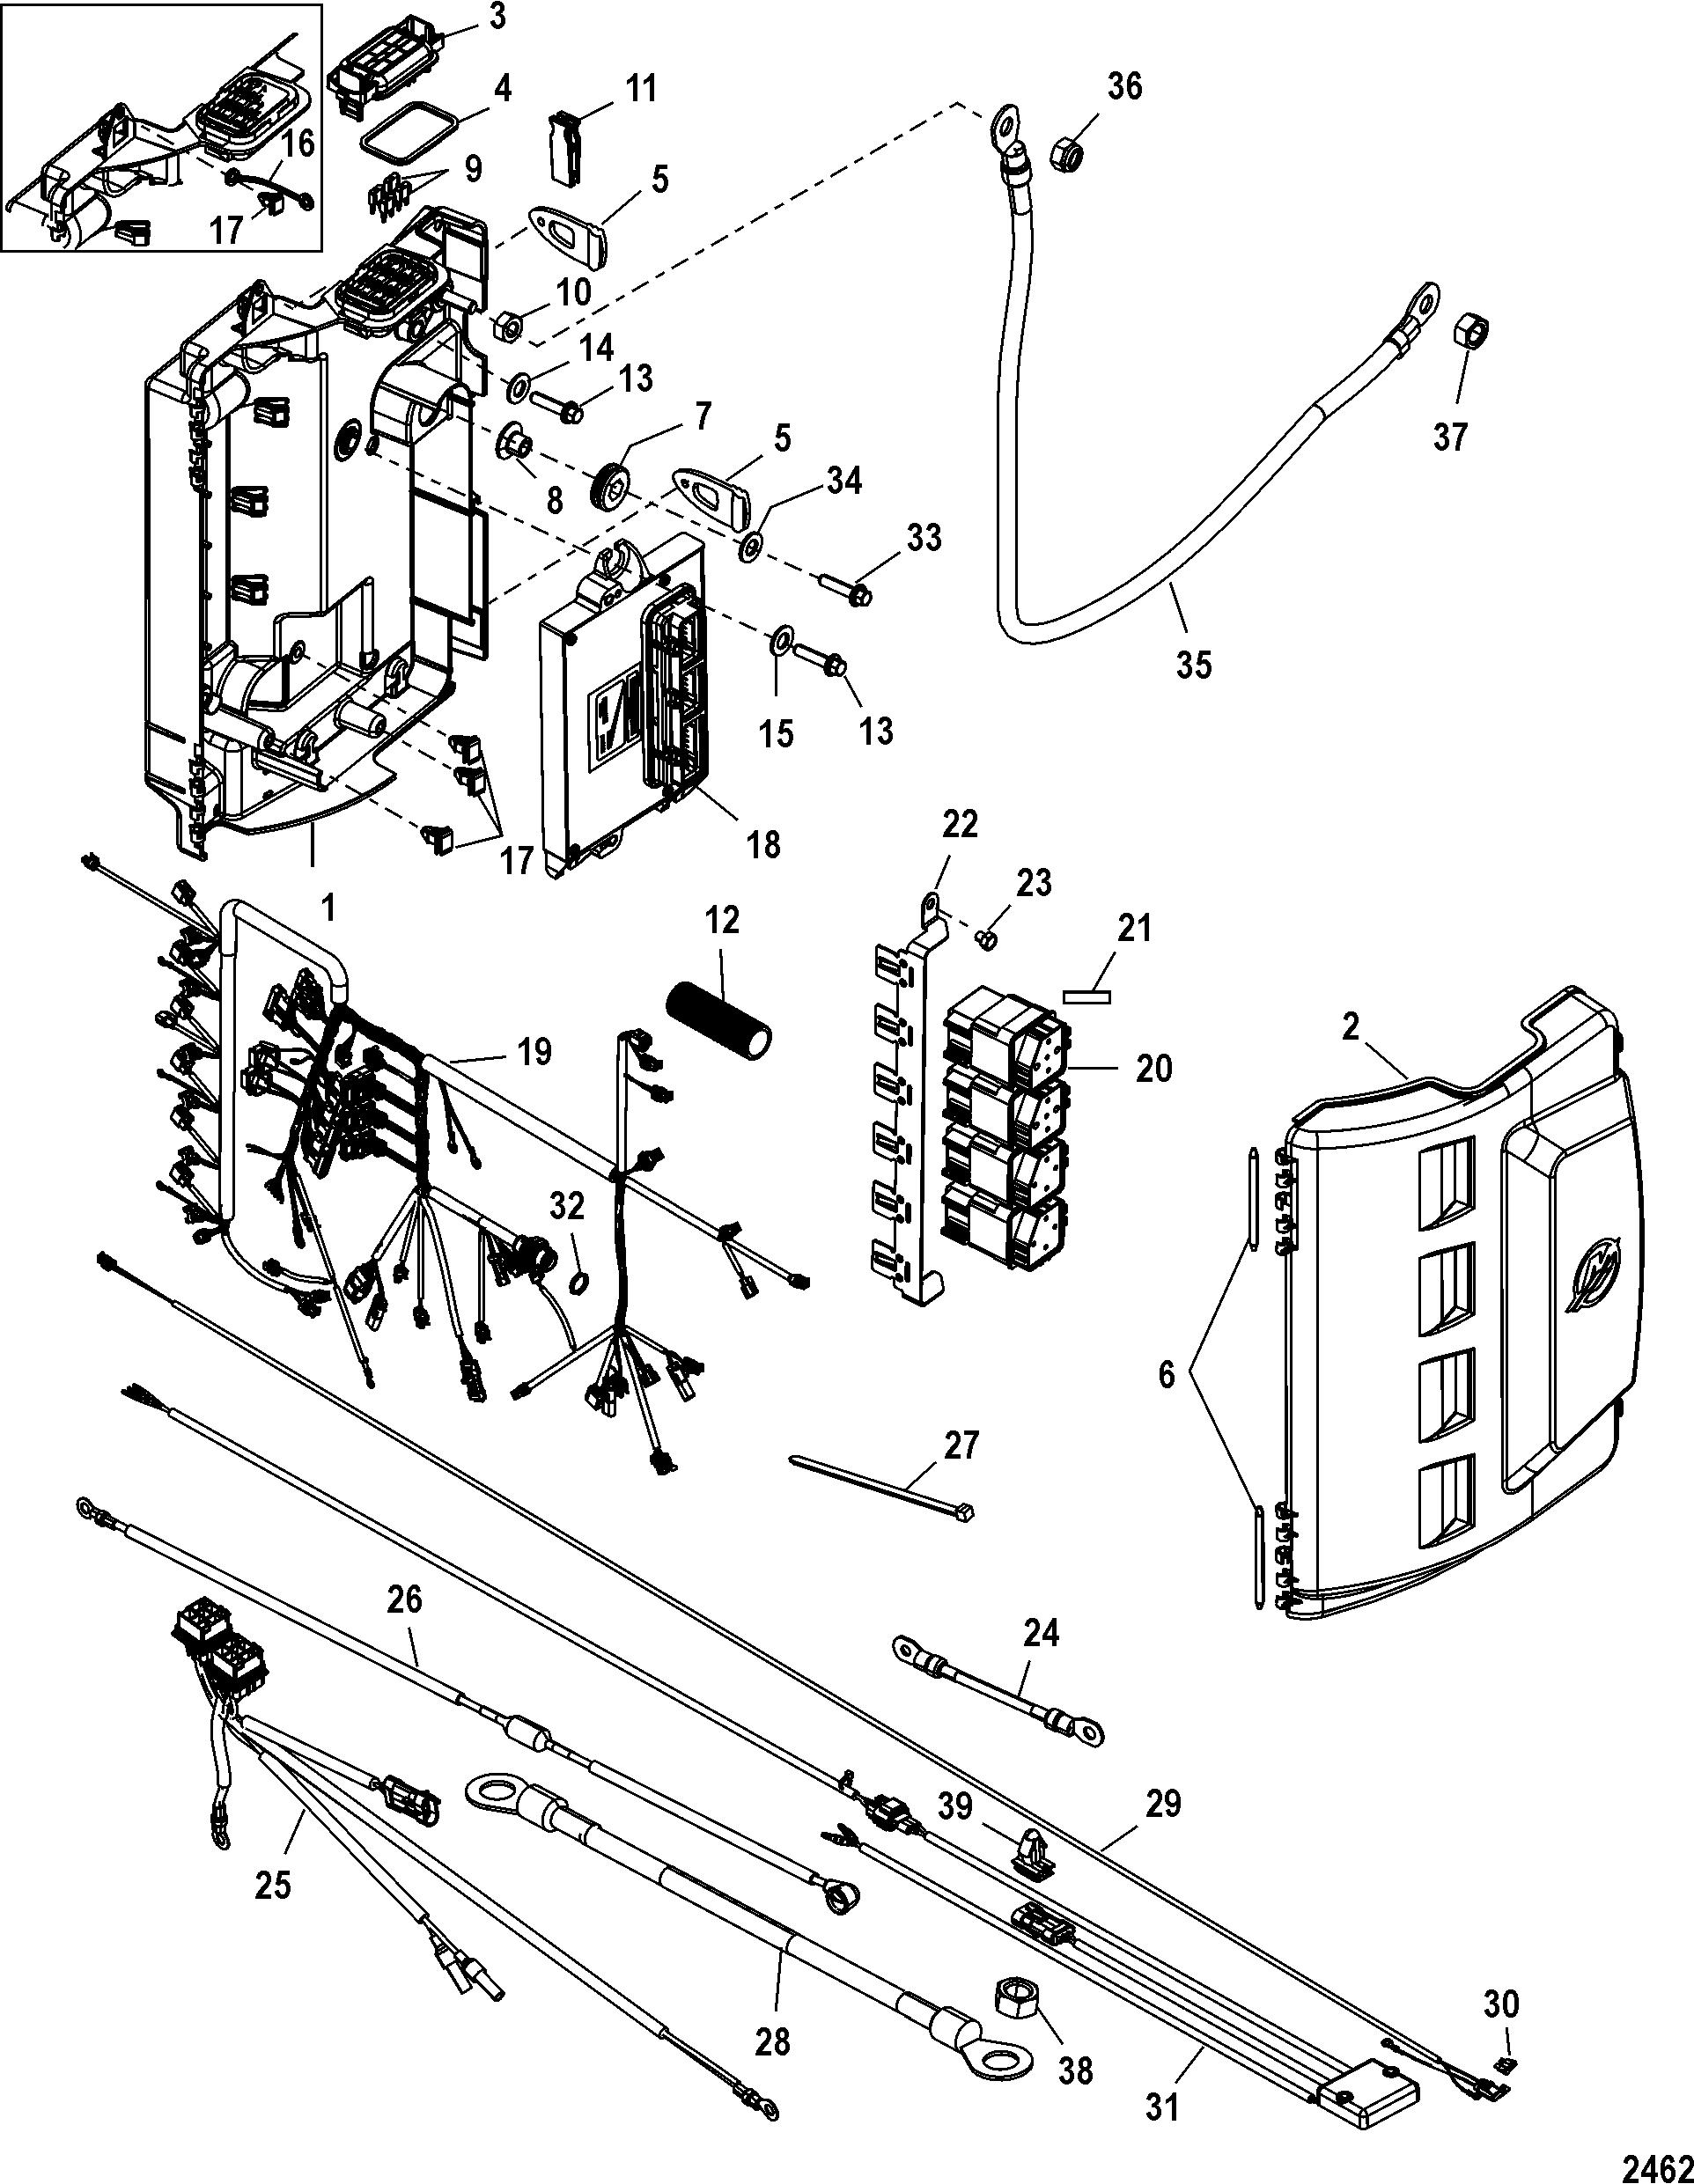 Mercury | MERCURY | 250 VERADO (4-STROKE)(6 CYL.) | 0T980000 THRU 1B226999  | Electrical Box Components - Mercury Outboard Motor Parts - Van's Sport  CenterVan's Sport Center